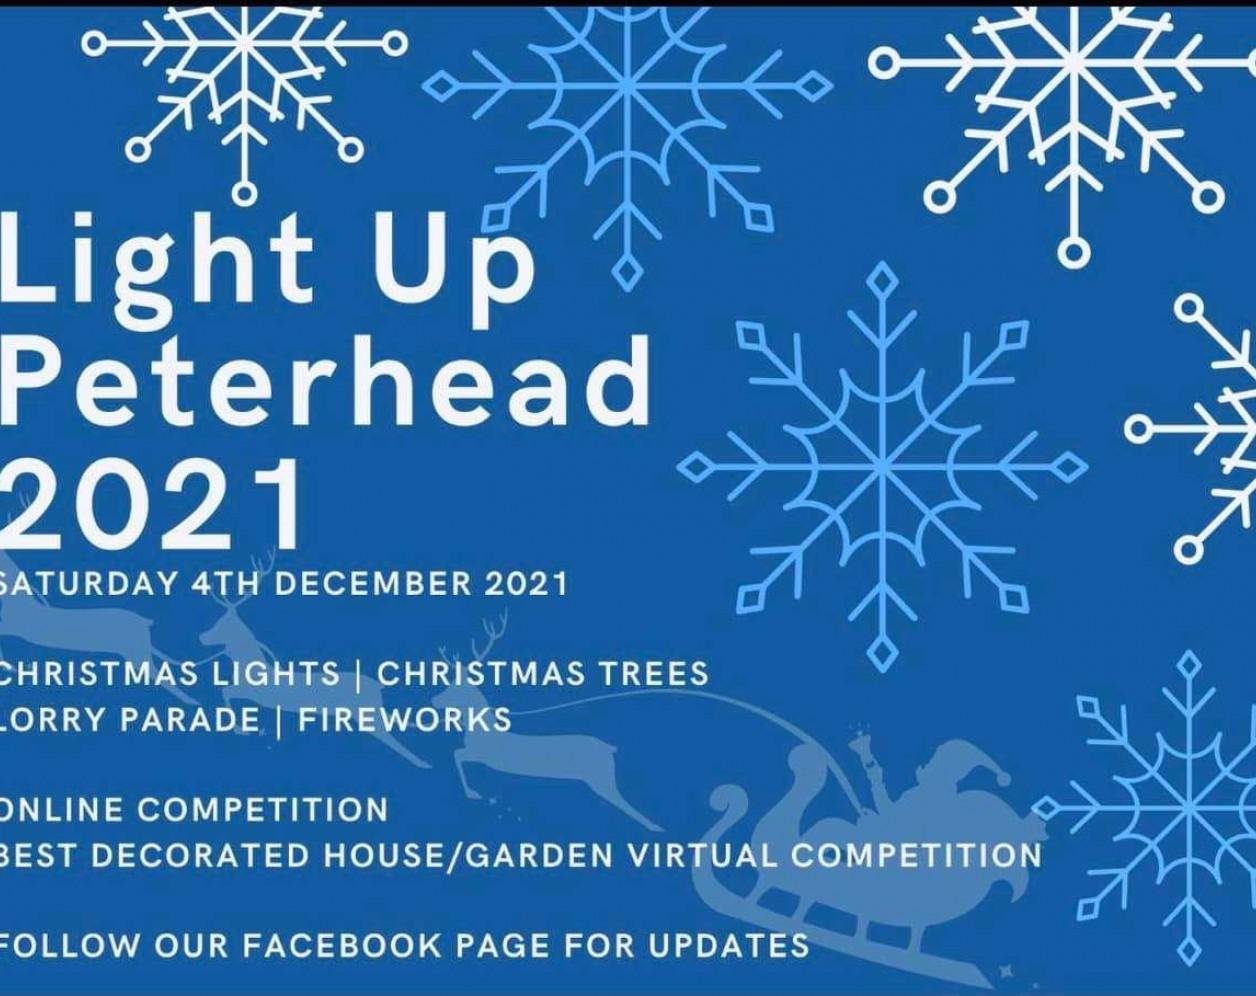 Light Up Peterhead